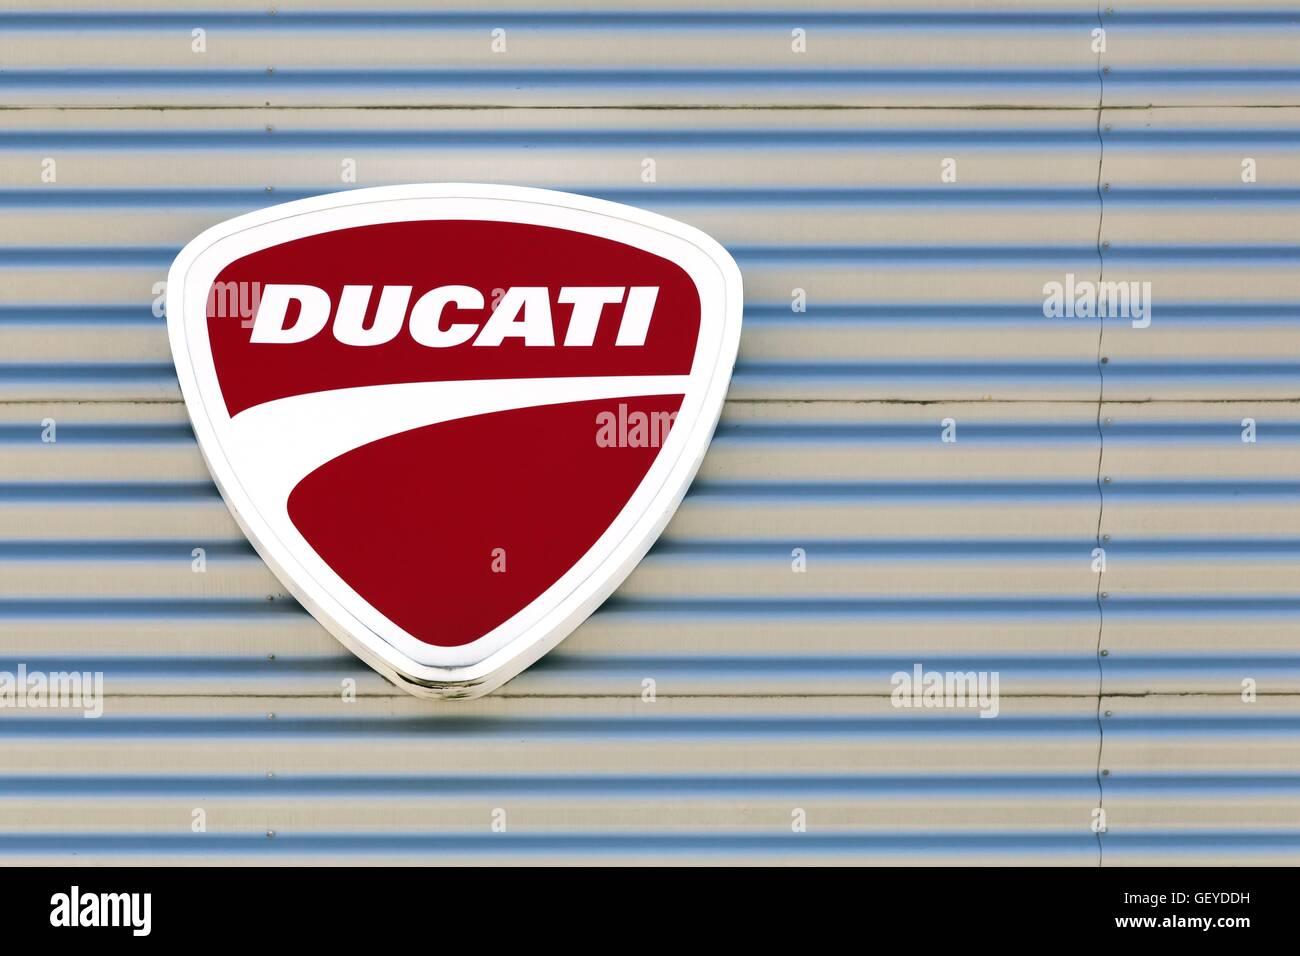 Ducati logo on a wall - Stock Image